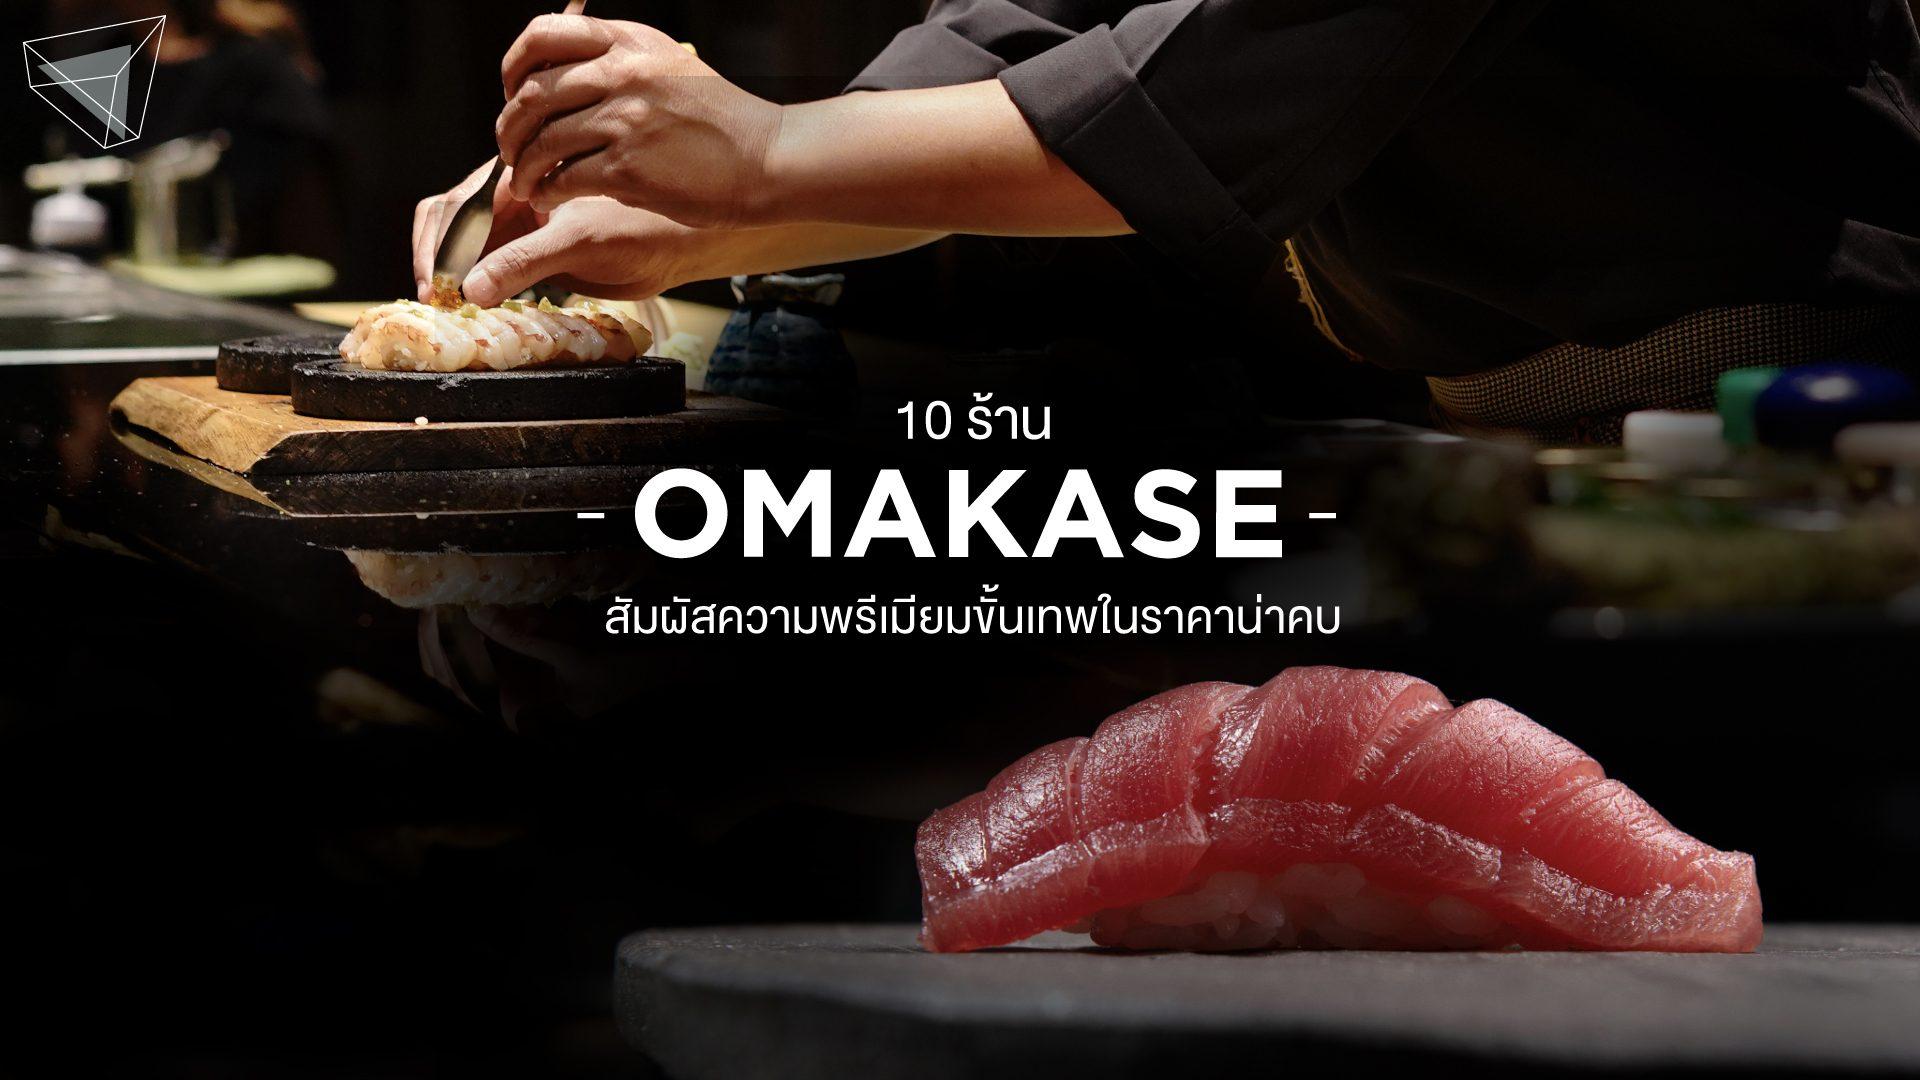 omakase โอมากาเสะ